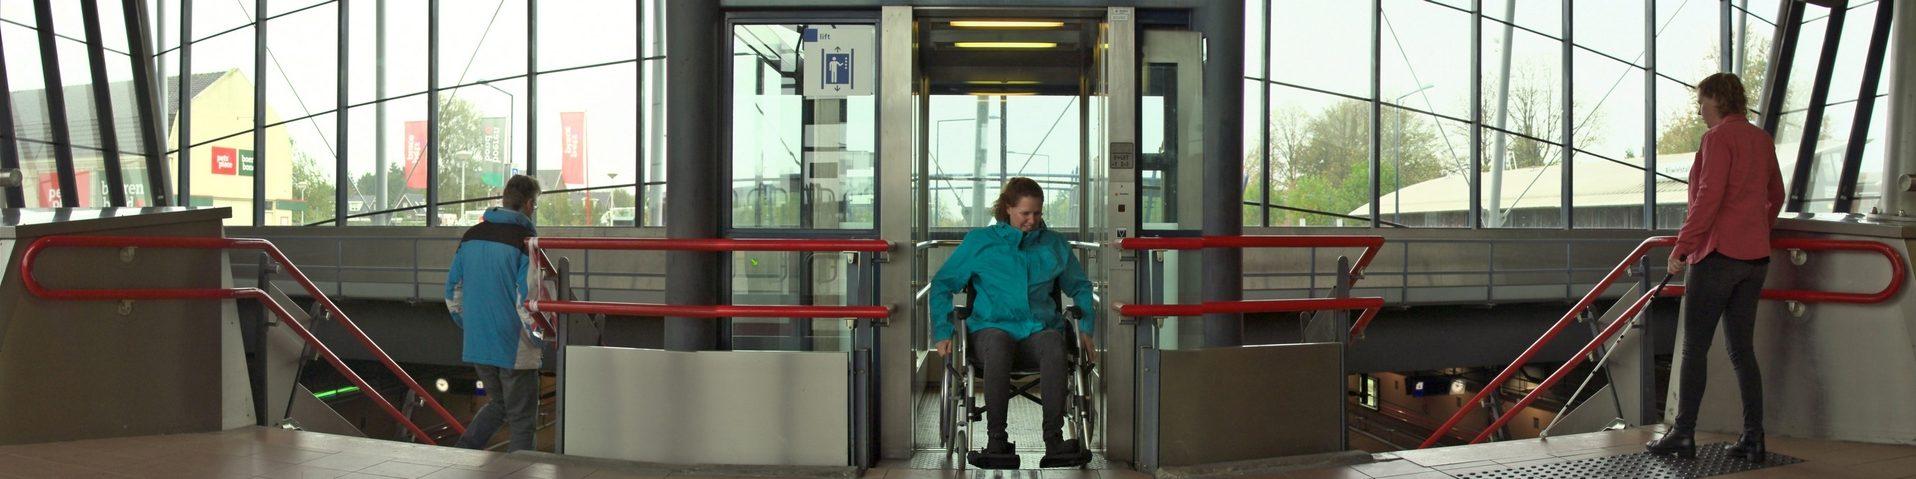 Trappen en lift station